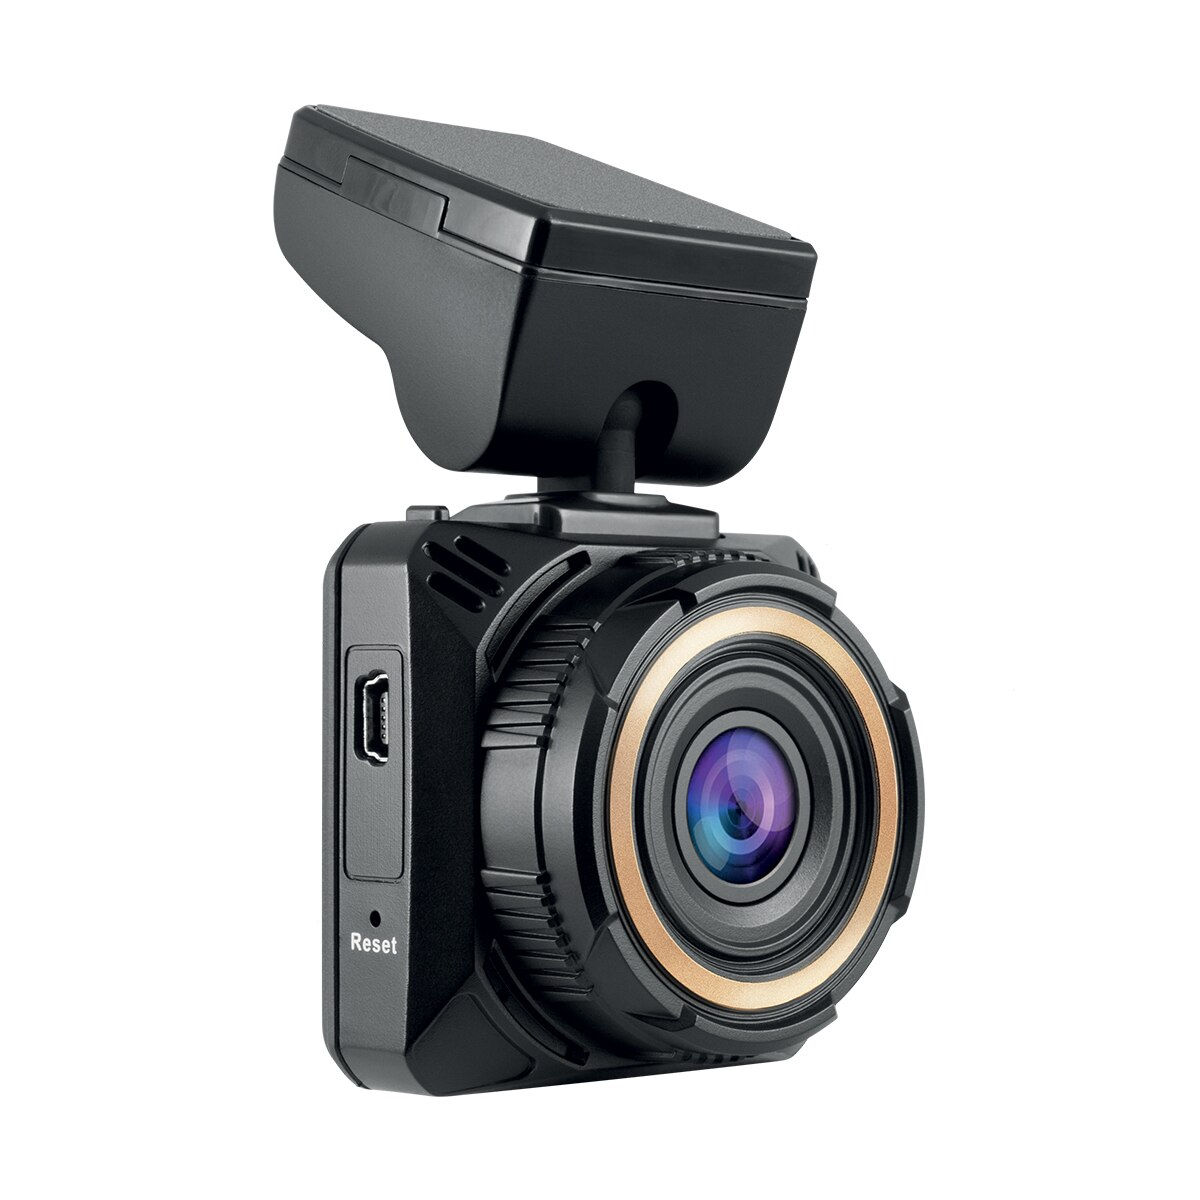 "Fotografie Camera Auto DVR Navitel R600 Quad HD, ecran 2.0"", inregistrare QHD + audio, vizibilitate 170 grade, G-sensor, auto-start, Negru"